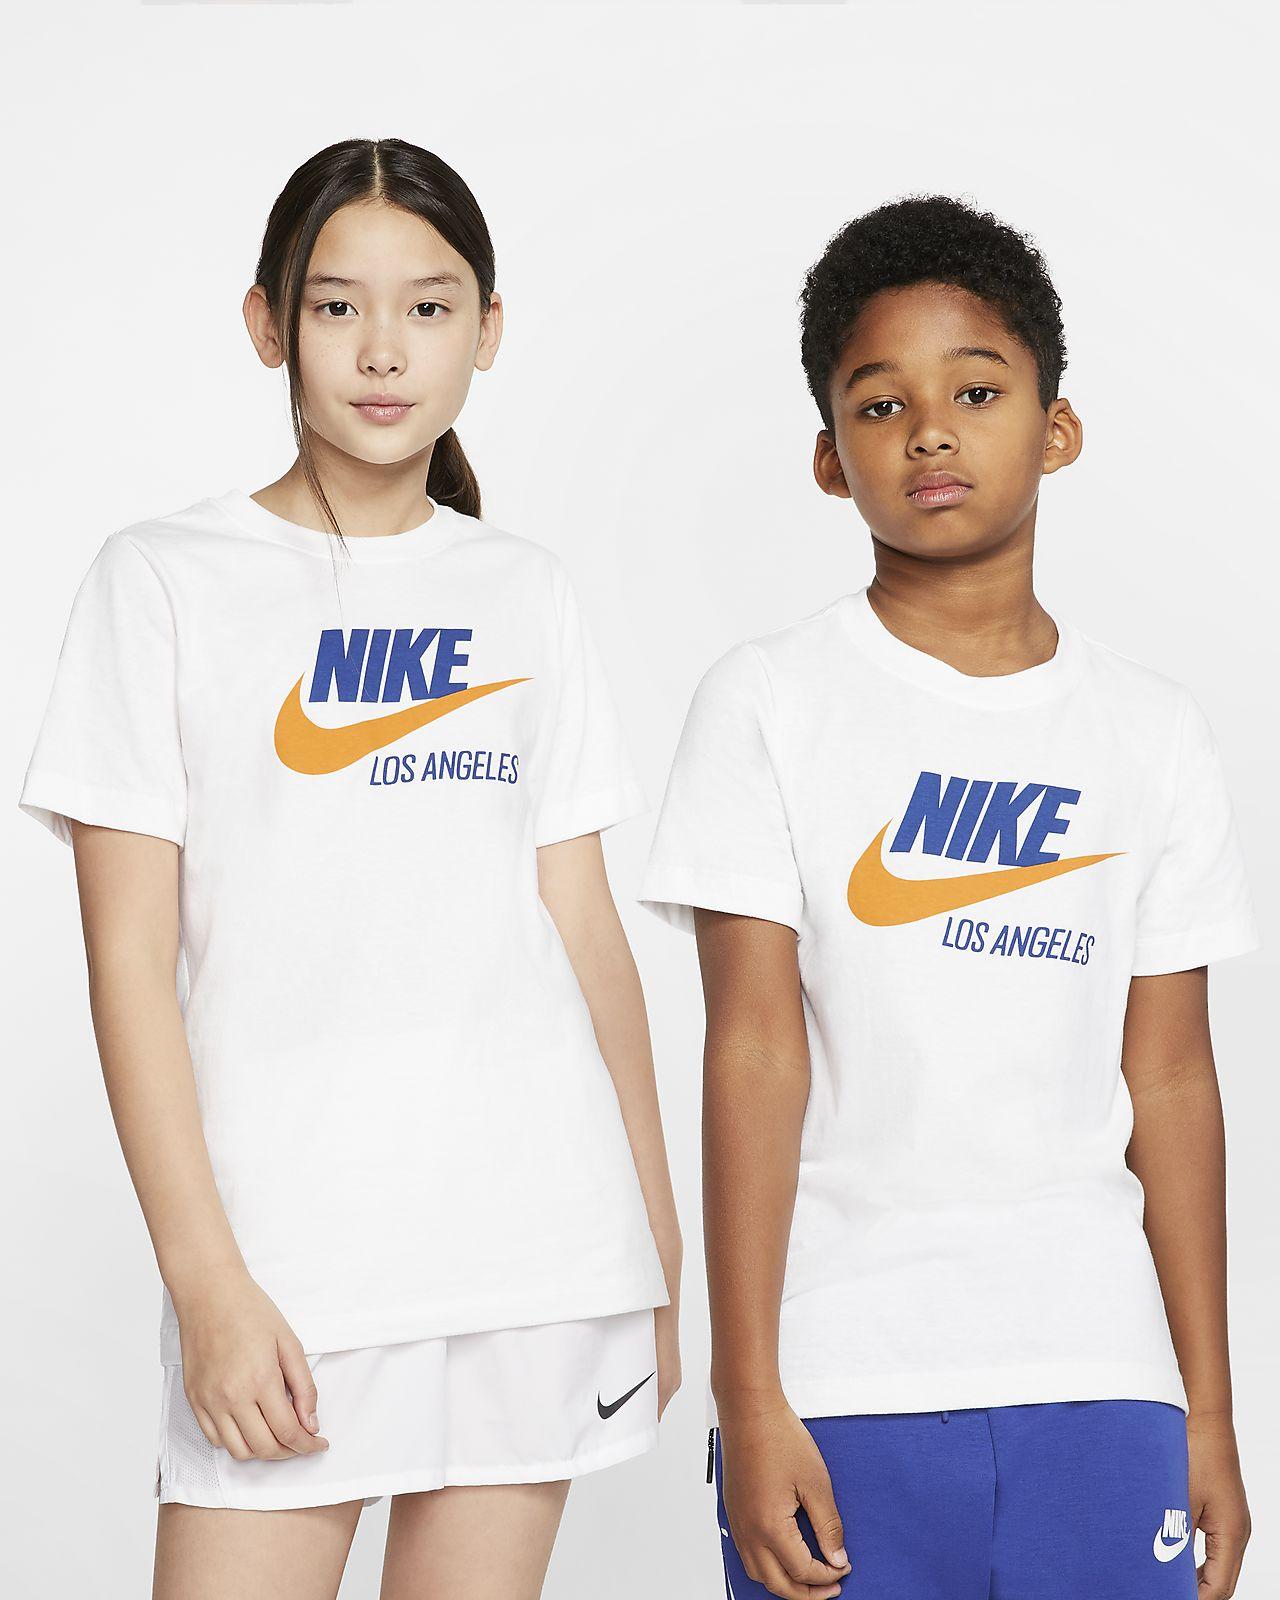 Nike Sportswear Los Angeles Big Kids' T-Shirt